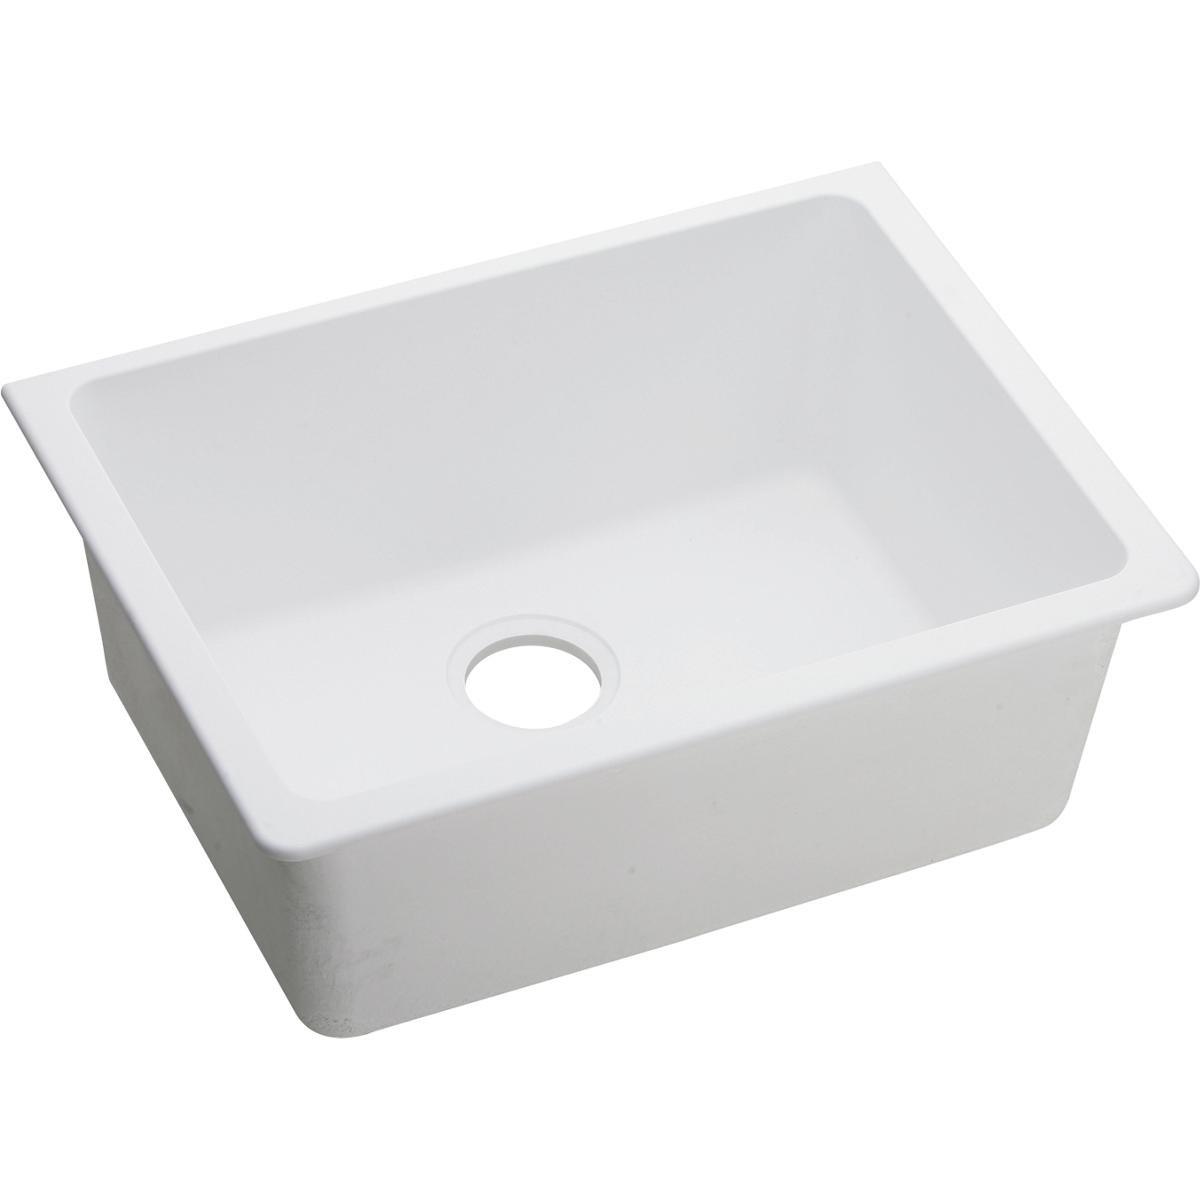 Elkay Quartz Classic ELGU2522WH0 Single Bowl Undermount Sink, White by Elkay (Image #3)